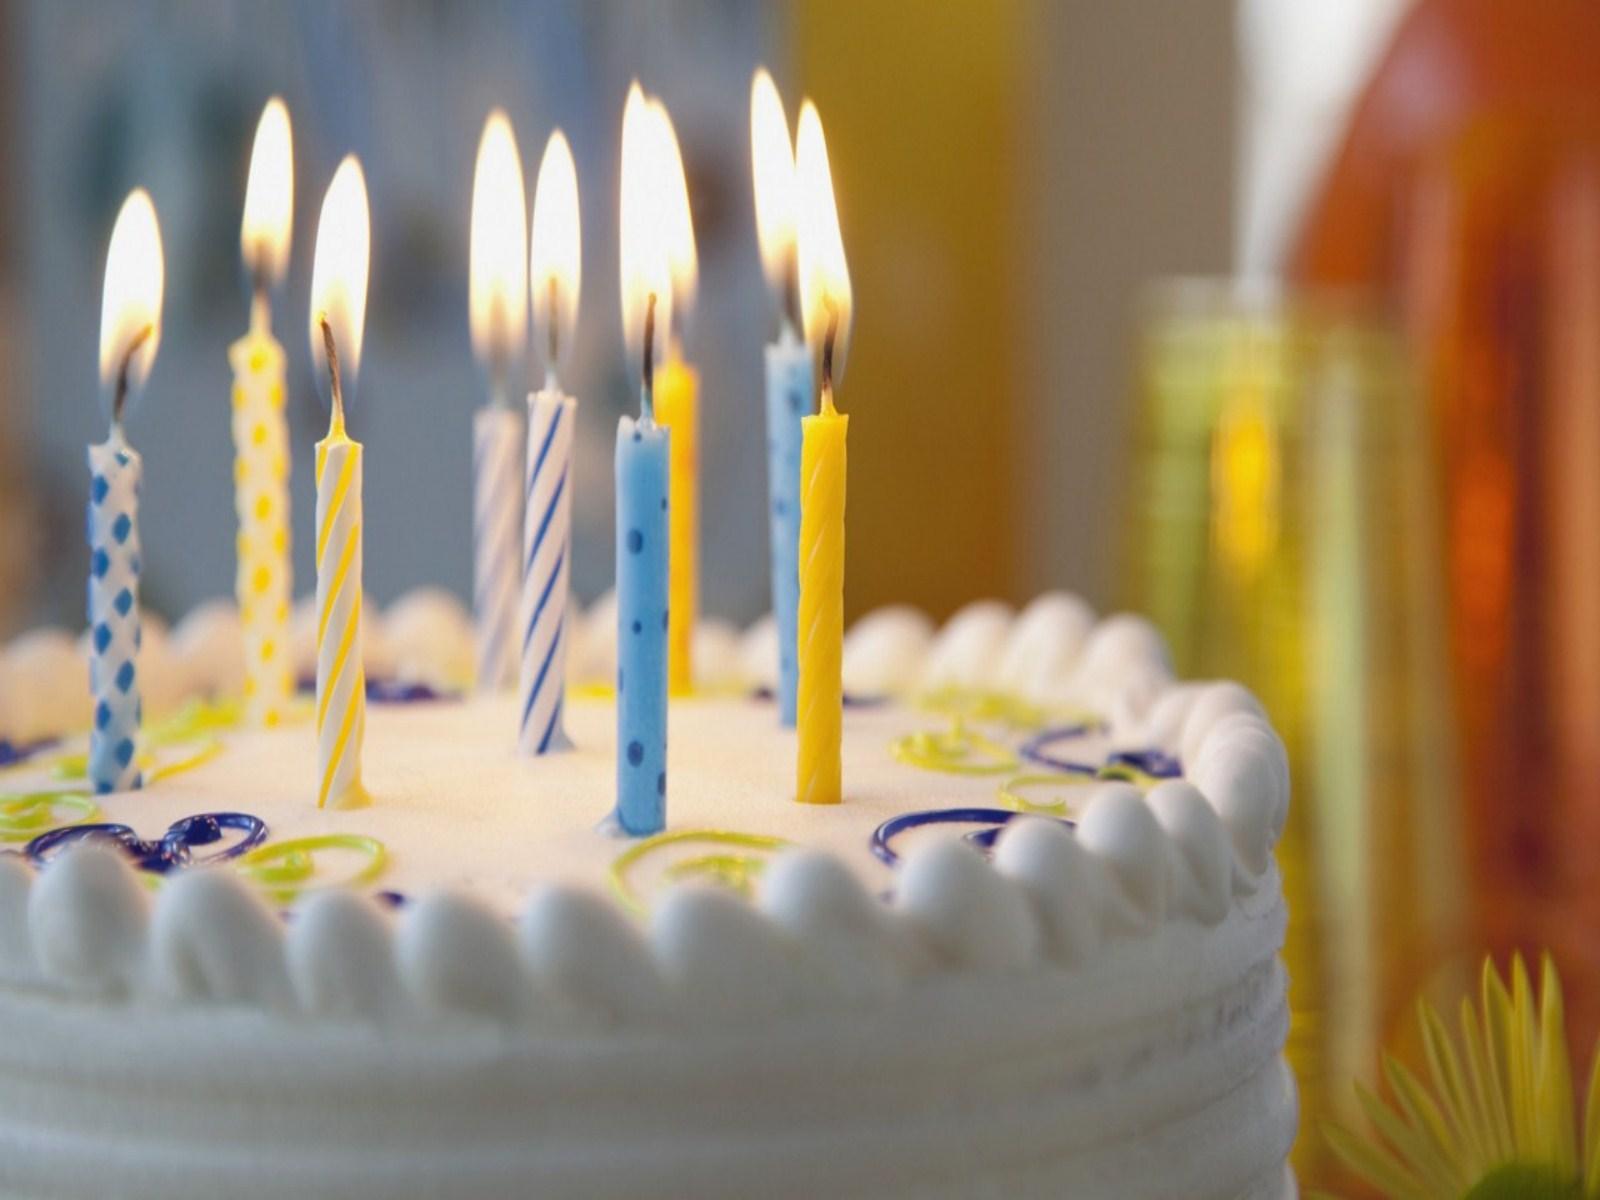 http://2.bp.blogspot.com/-ep6cQT2pVNA/UOSUy8UNgMI/AAAAAAAALUw/ybIYRTAn8SE/s1600/birthday_cake_wallpaper-other.jpg